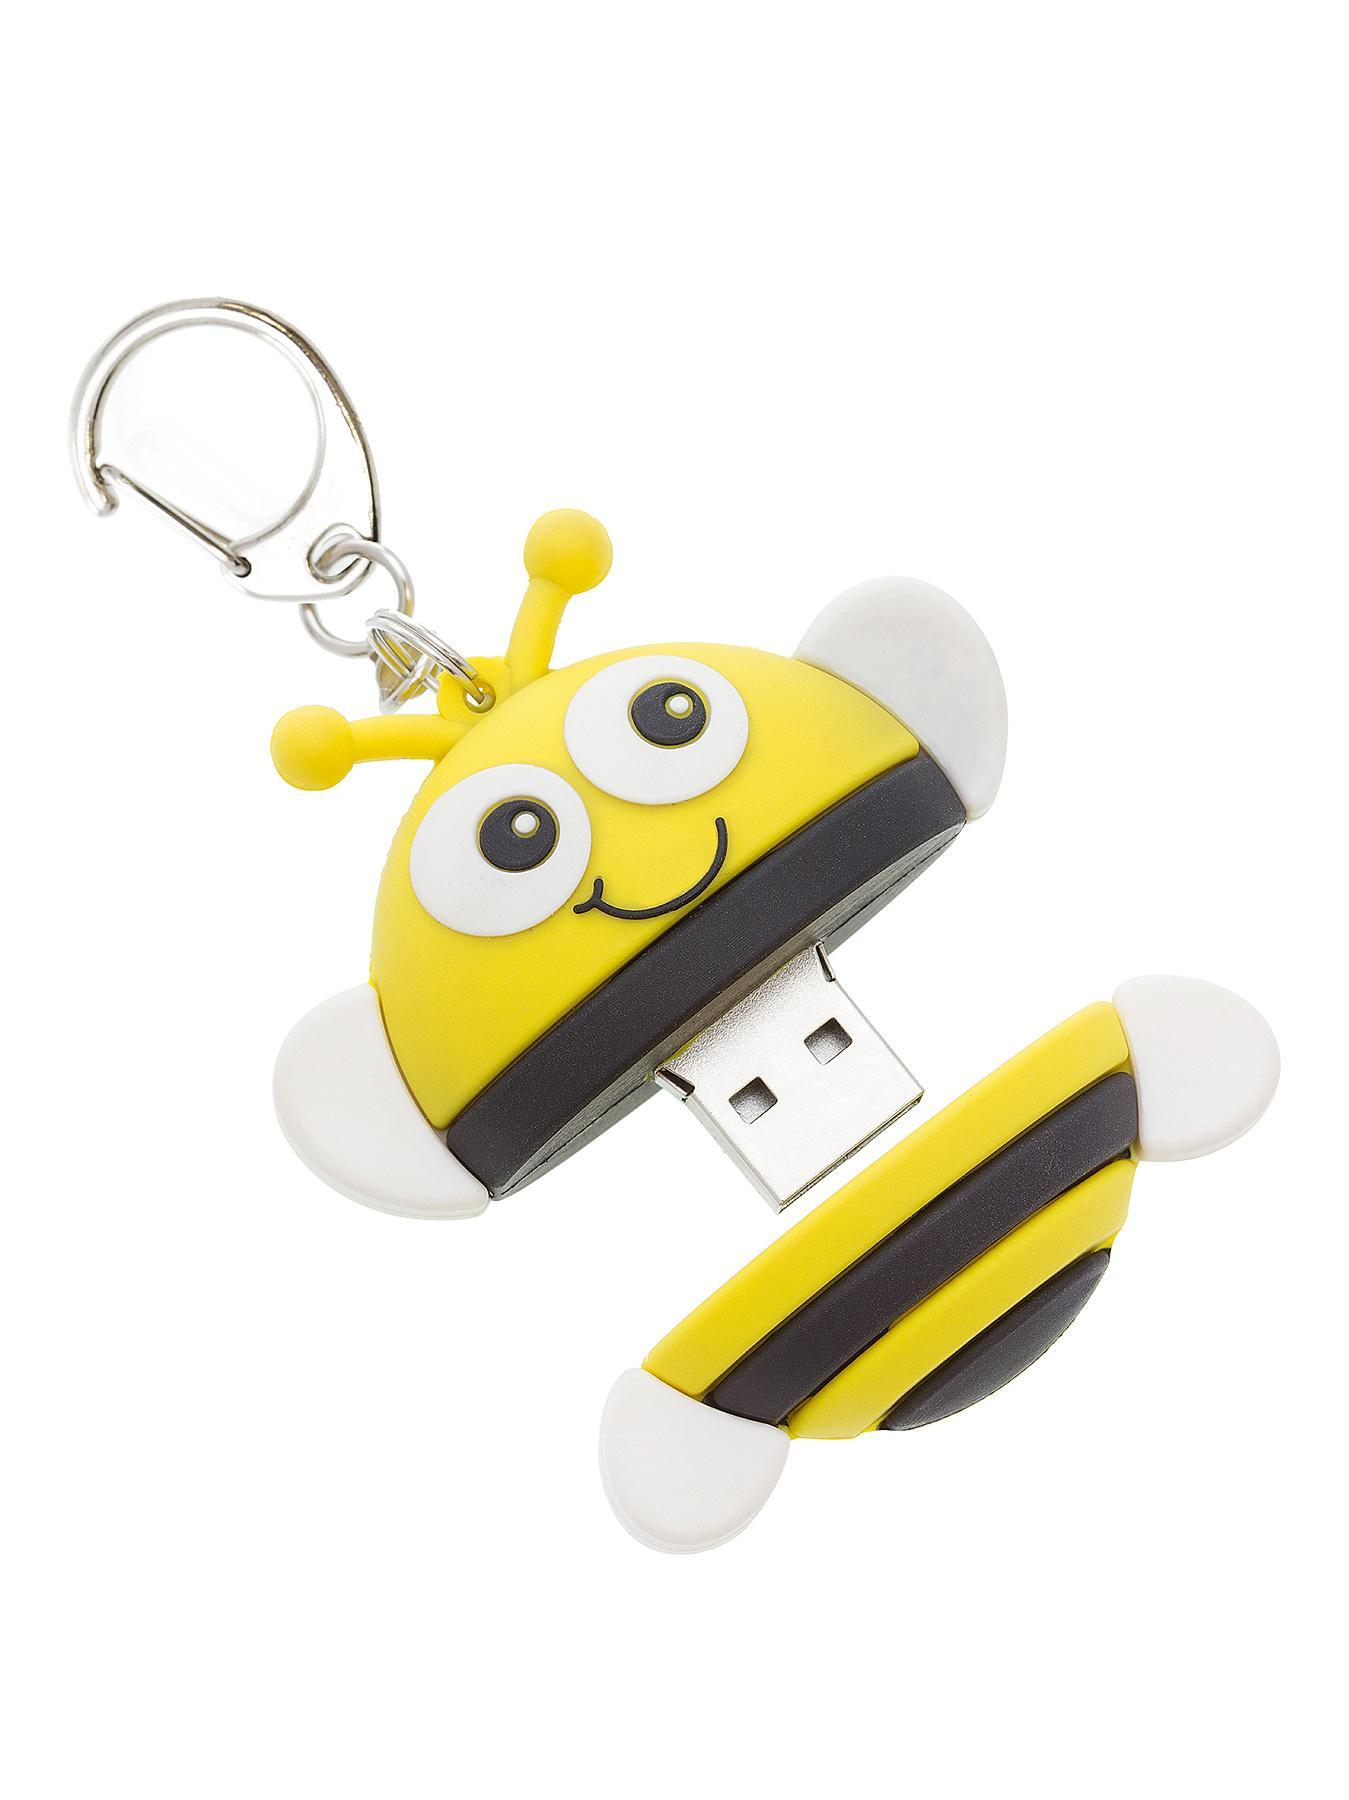 Trendz 8Gb Character Bee USB Drive